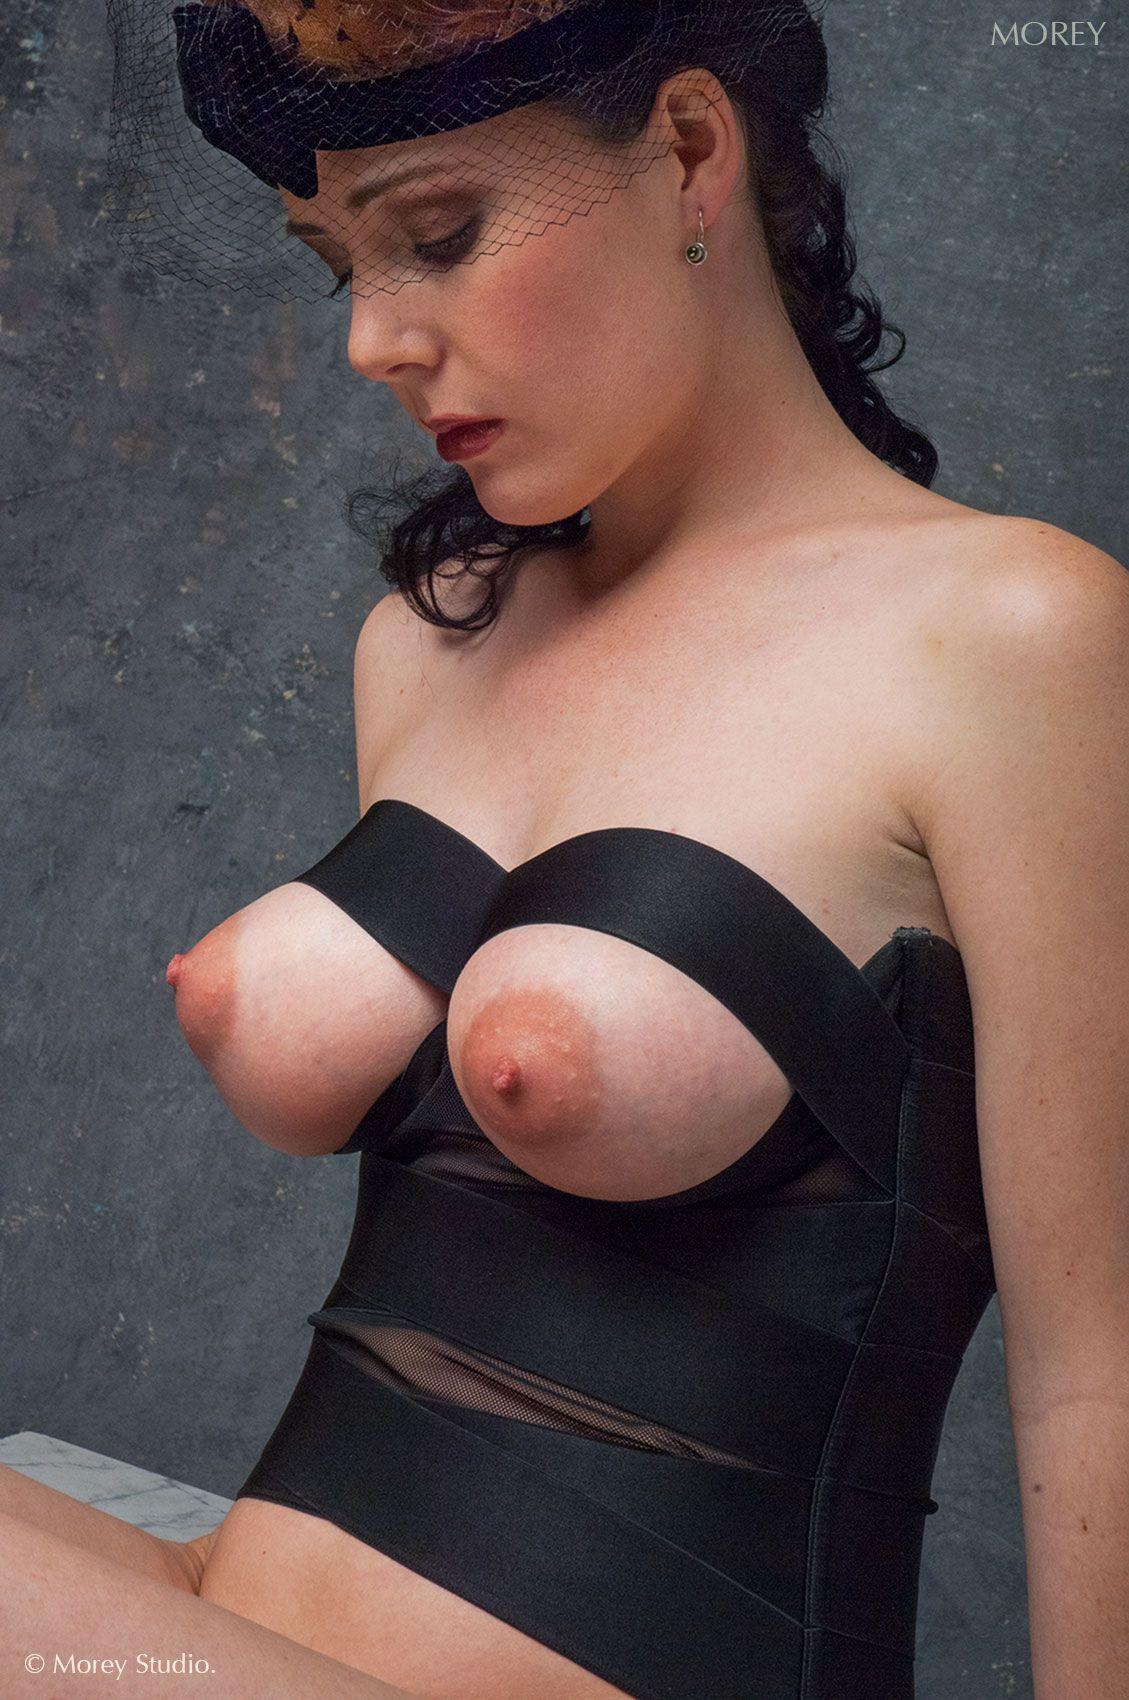 Congratulate, Morey studio heather nipples